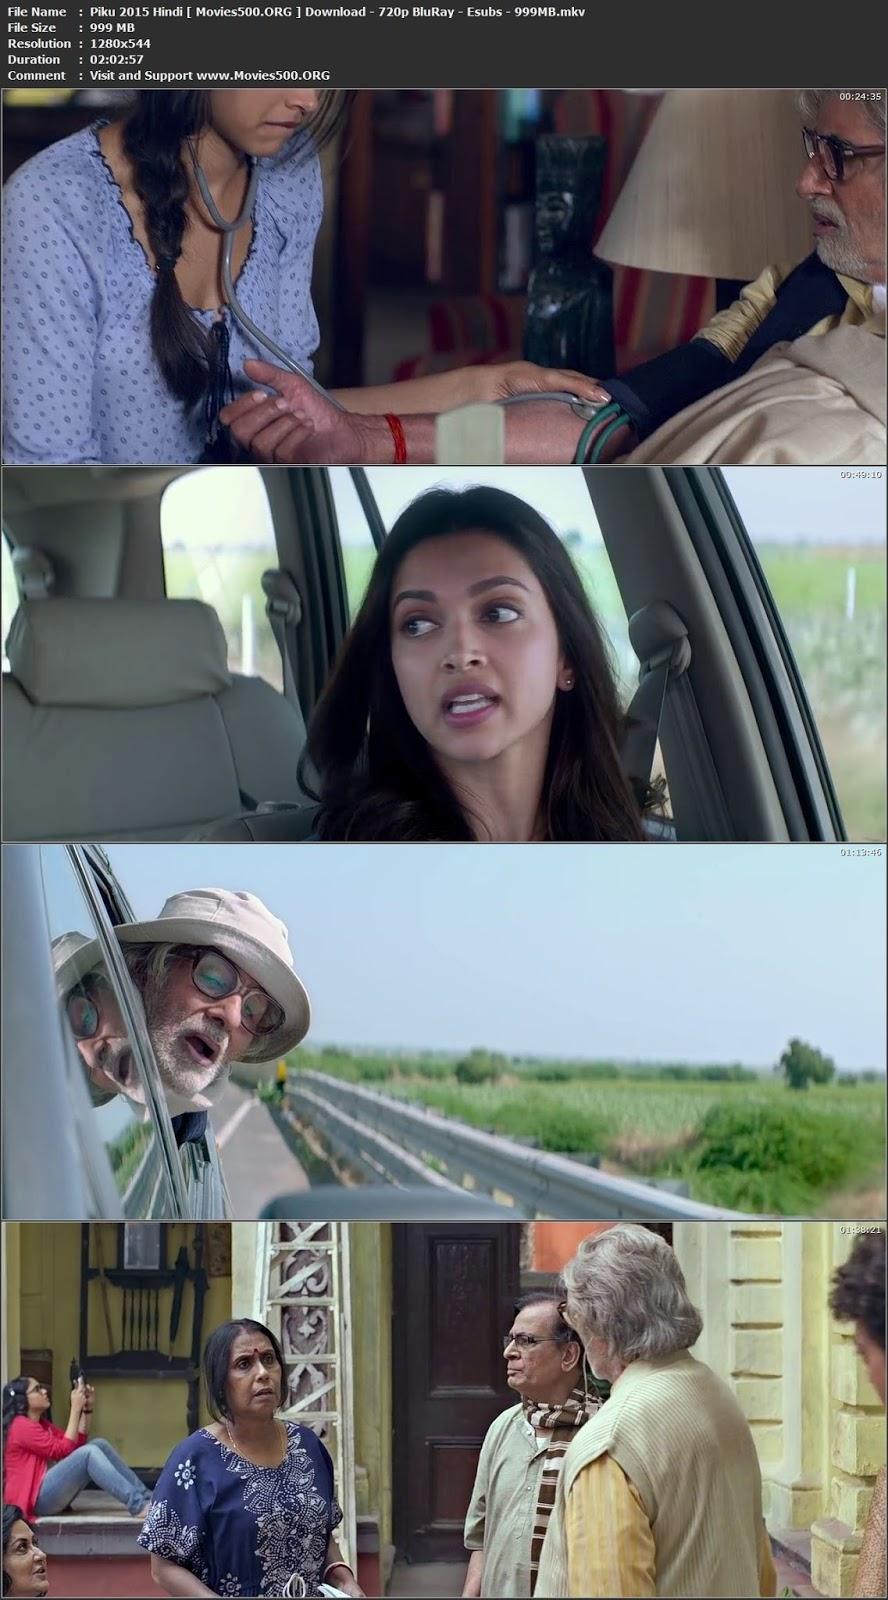 Piku 2015 Hindi Movie Download BluRay 720p 999MB ESubs at xcharge.net